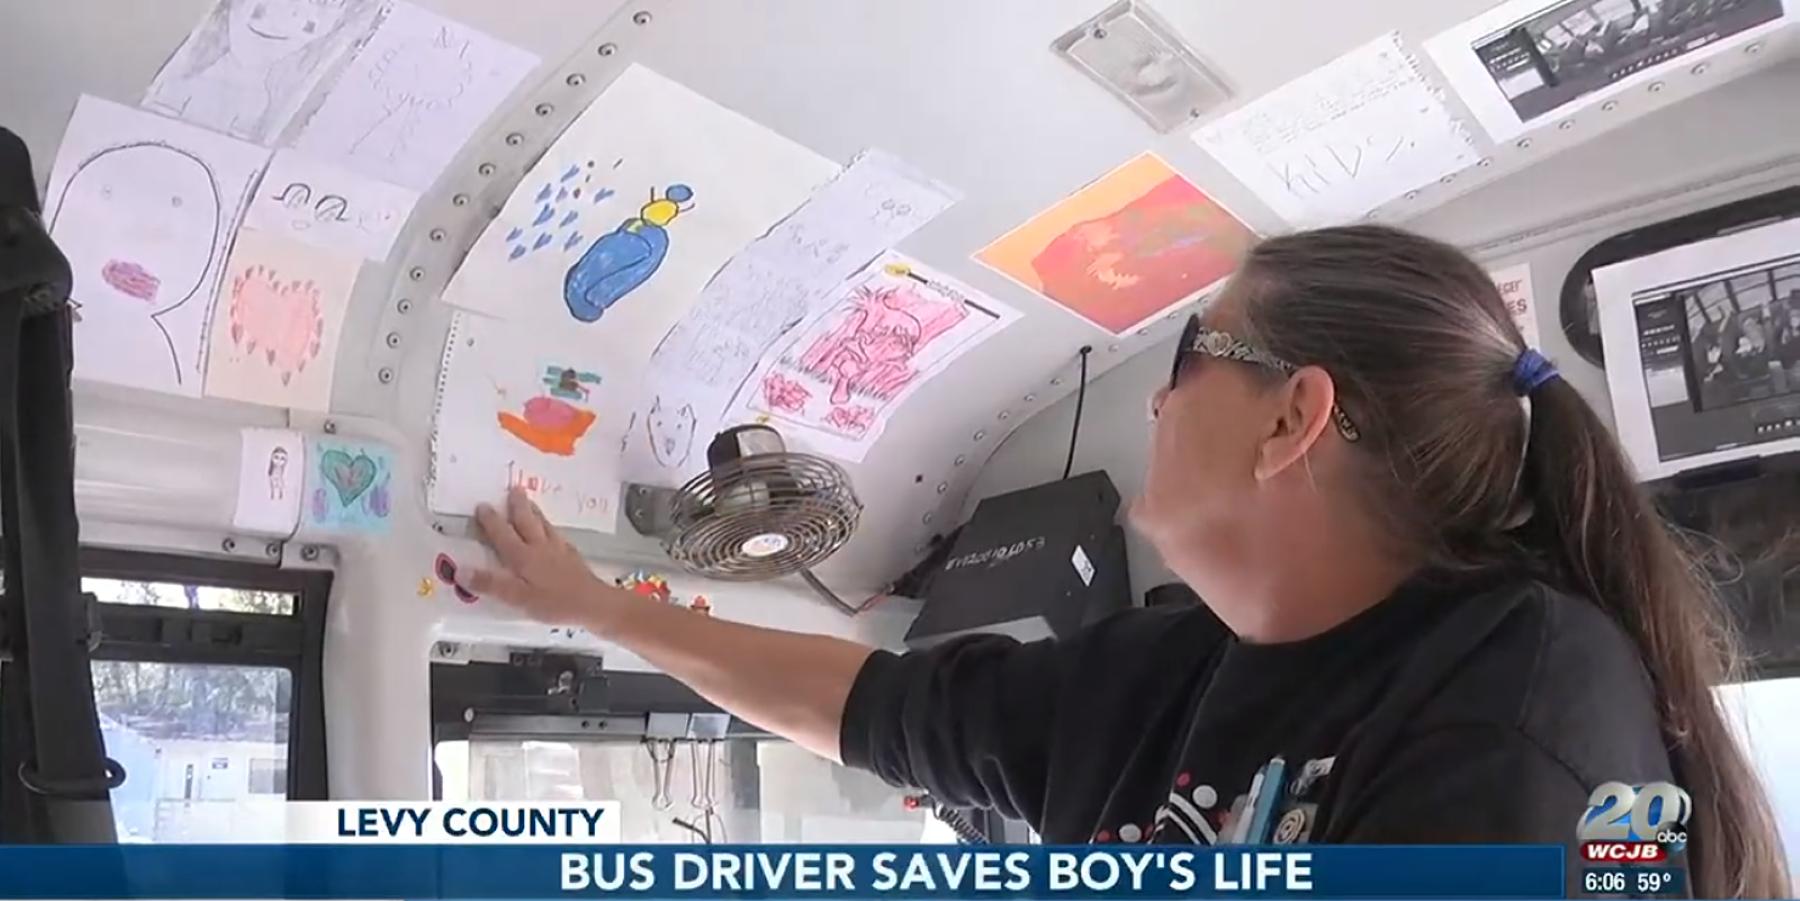 Bus driver Tanya Rivenburg saves boy's life